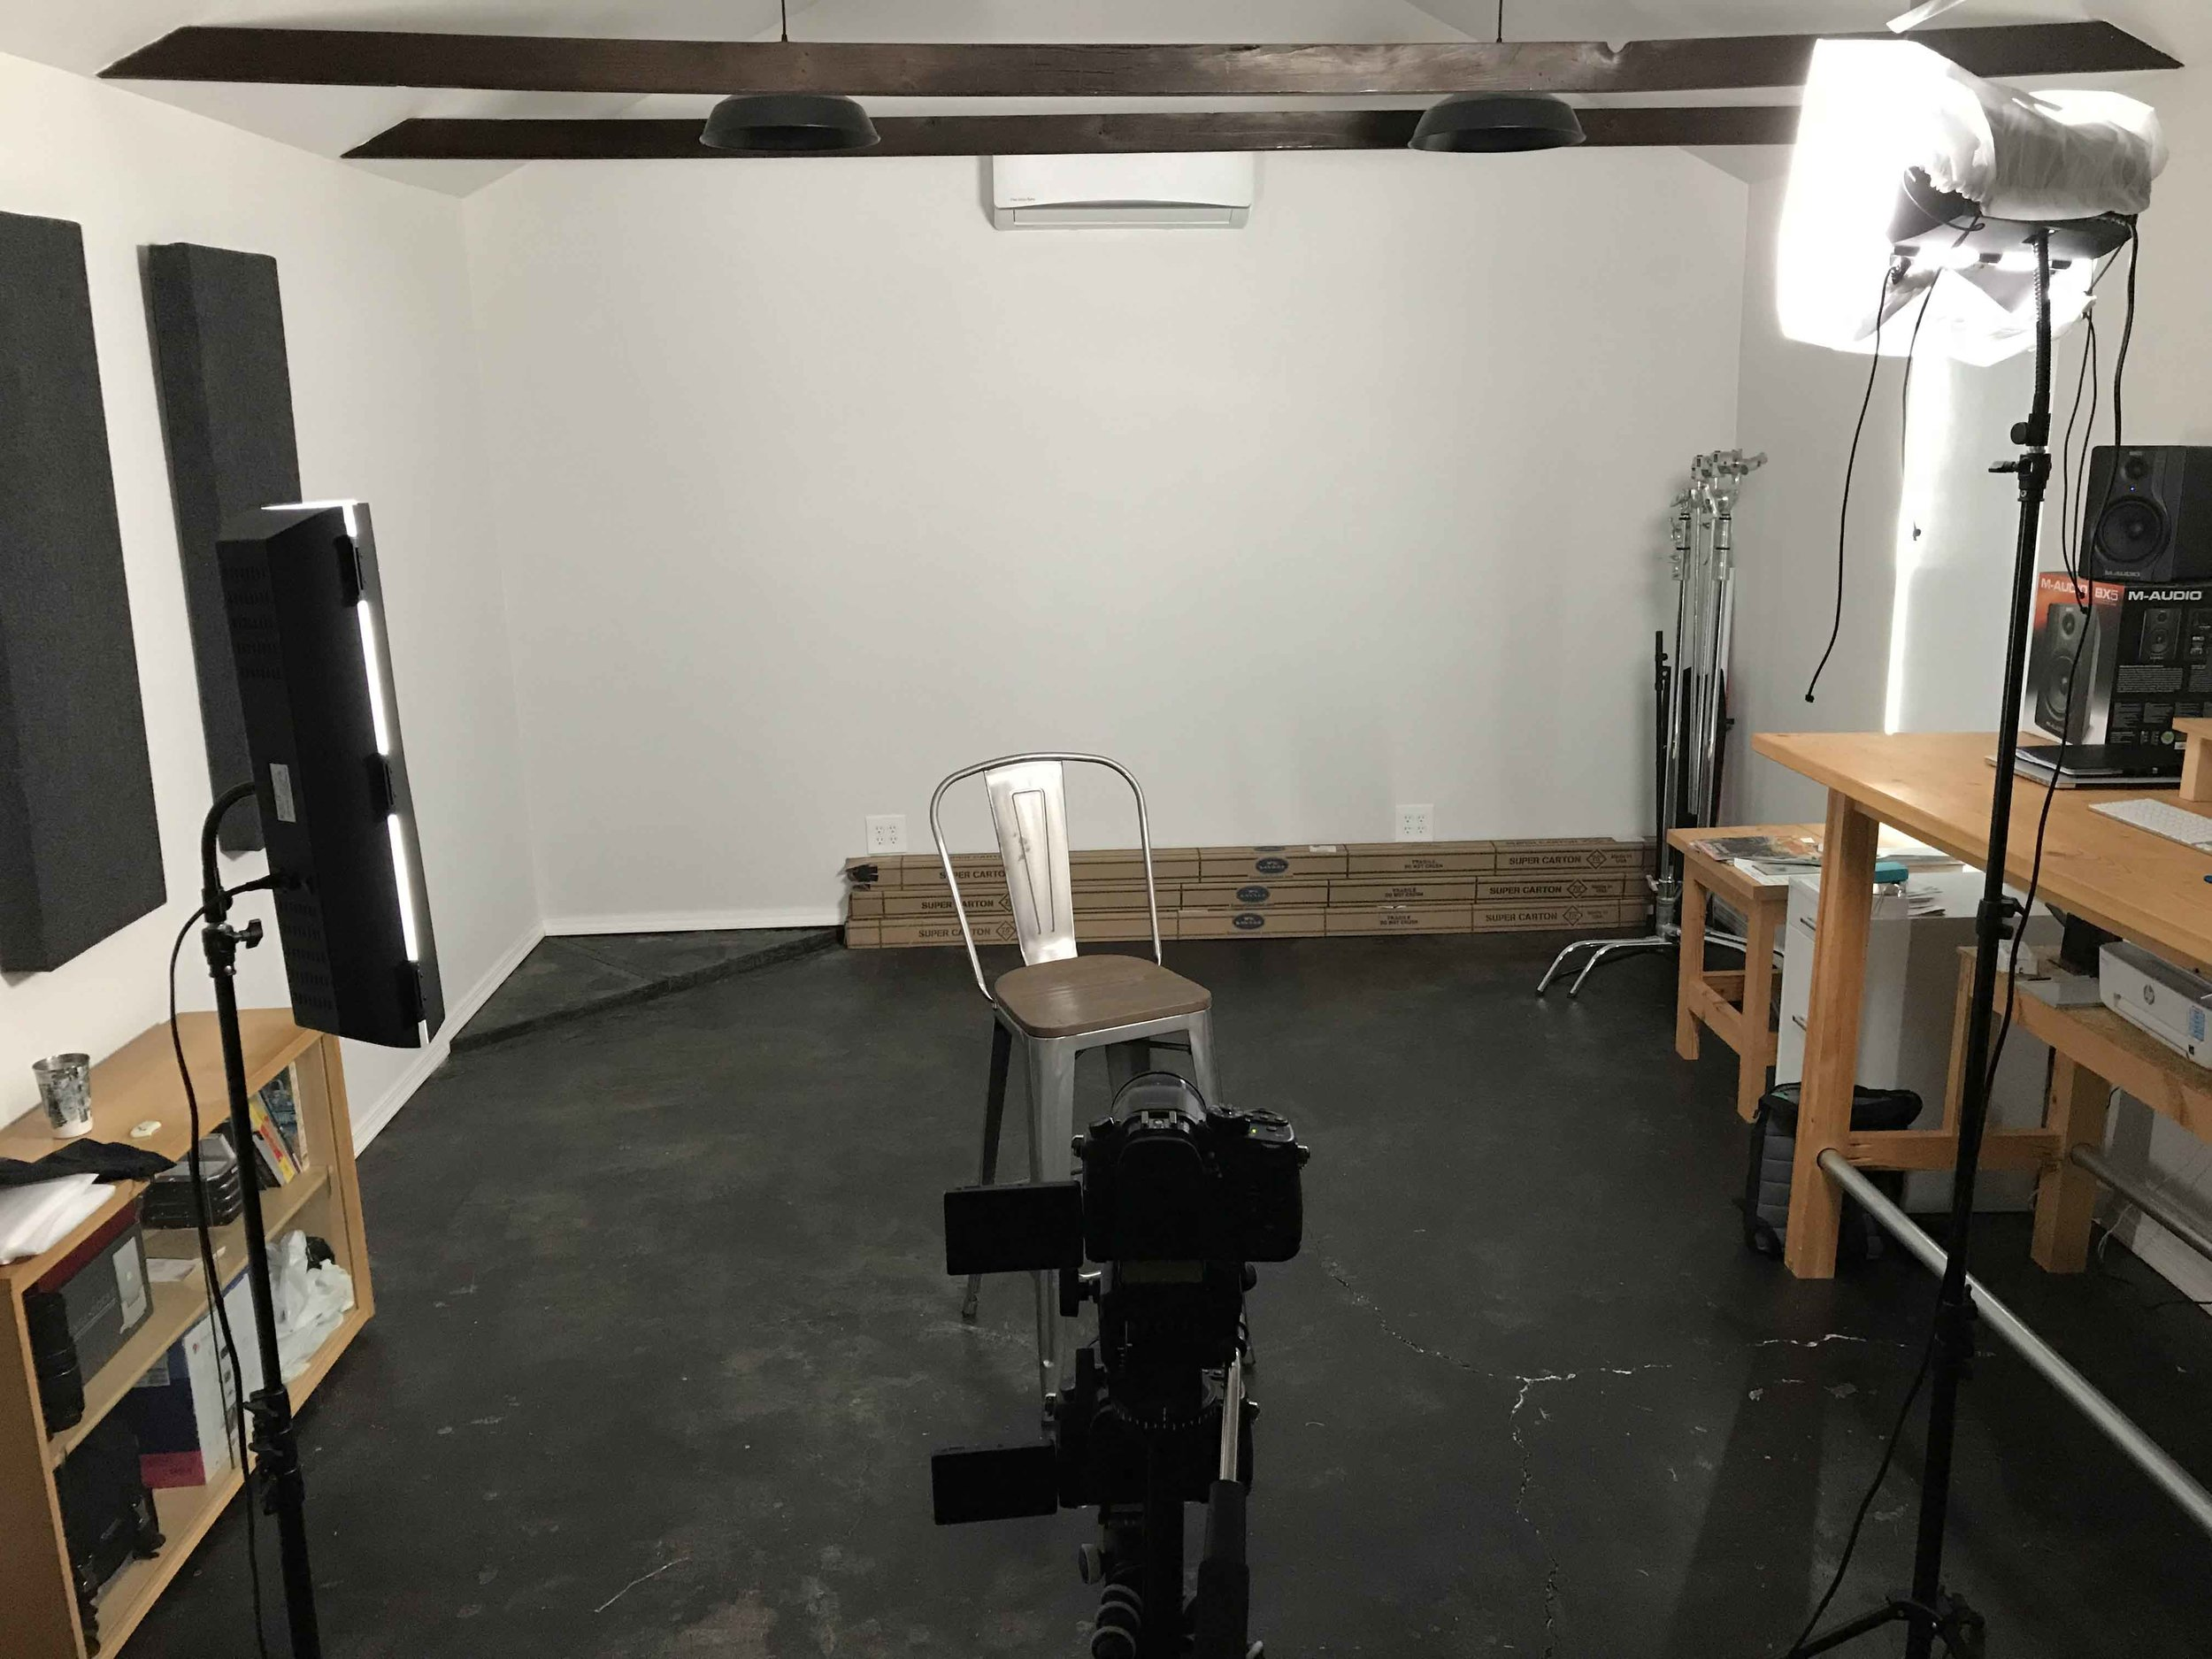 interview-lighting-guide-3-00009.jpg